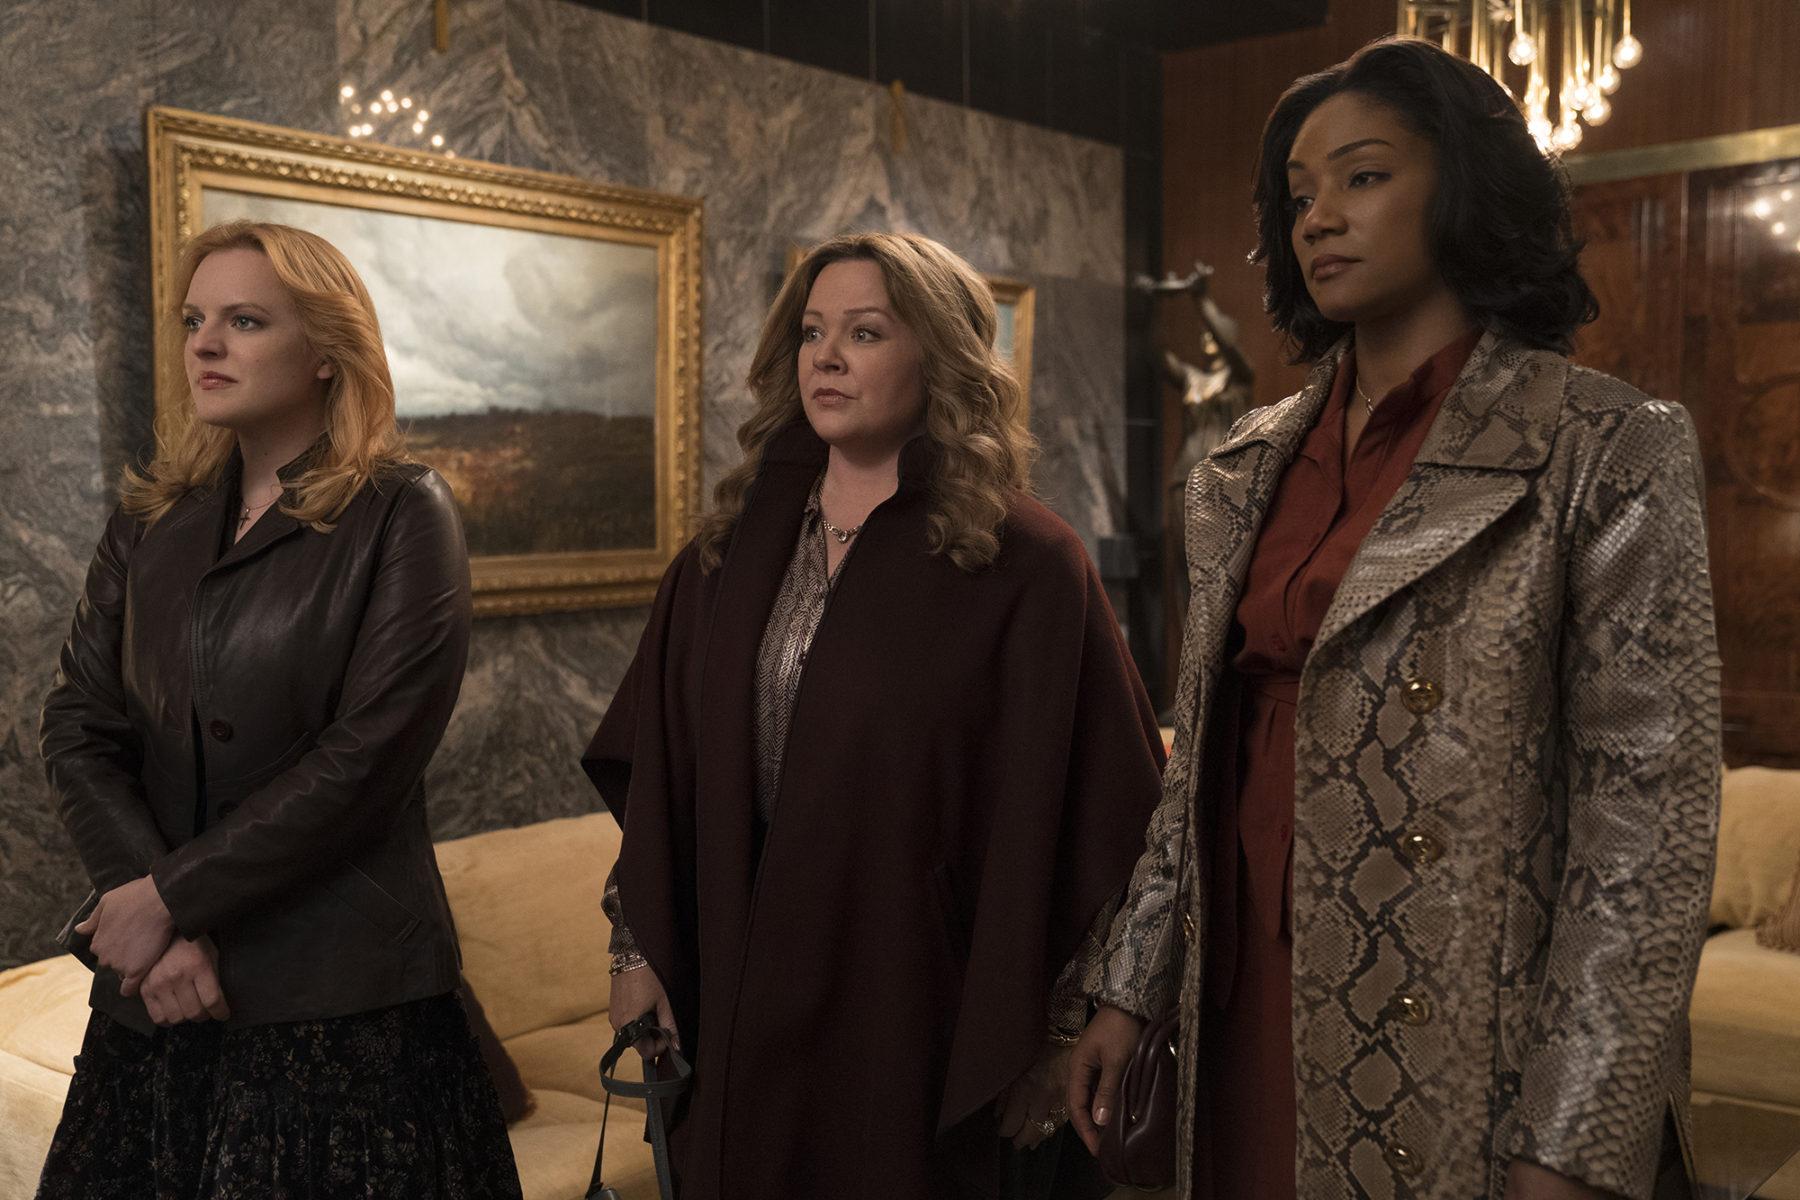 Melissa McCarthy, Tiffany Haddish, and Elizabeth Moss star in Warner Bros. The Kitchen